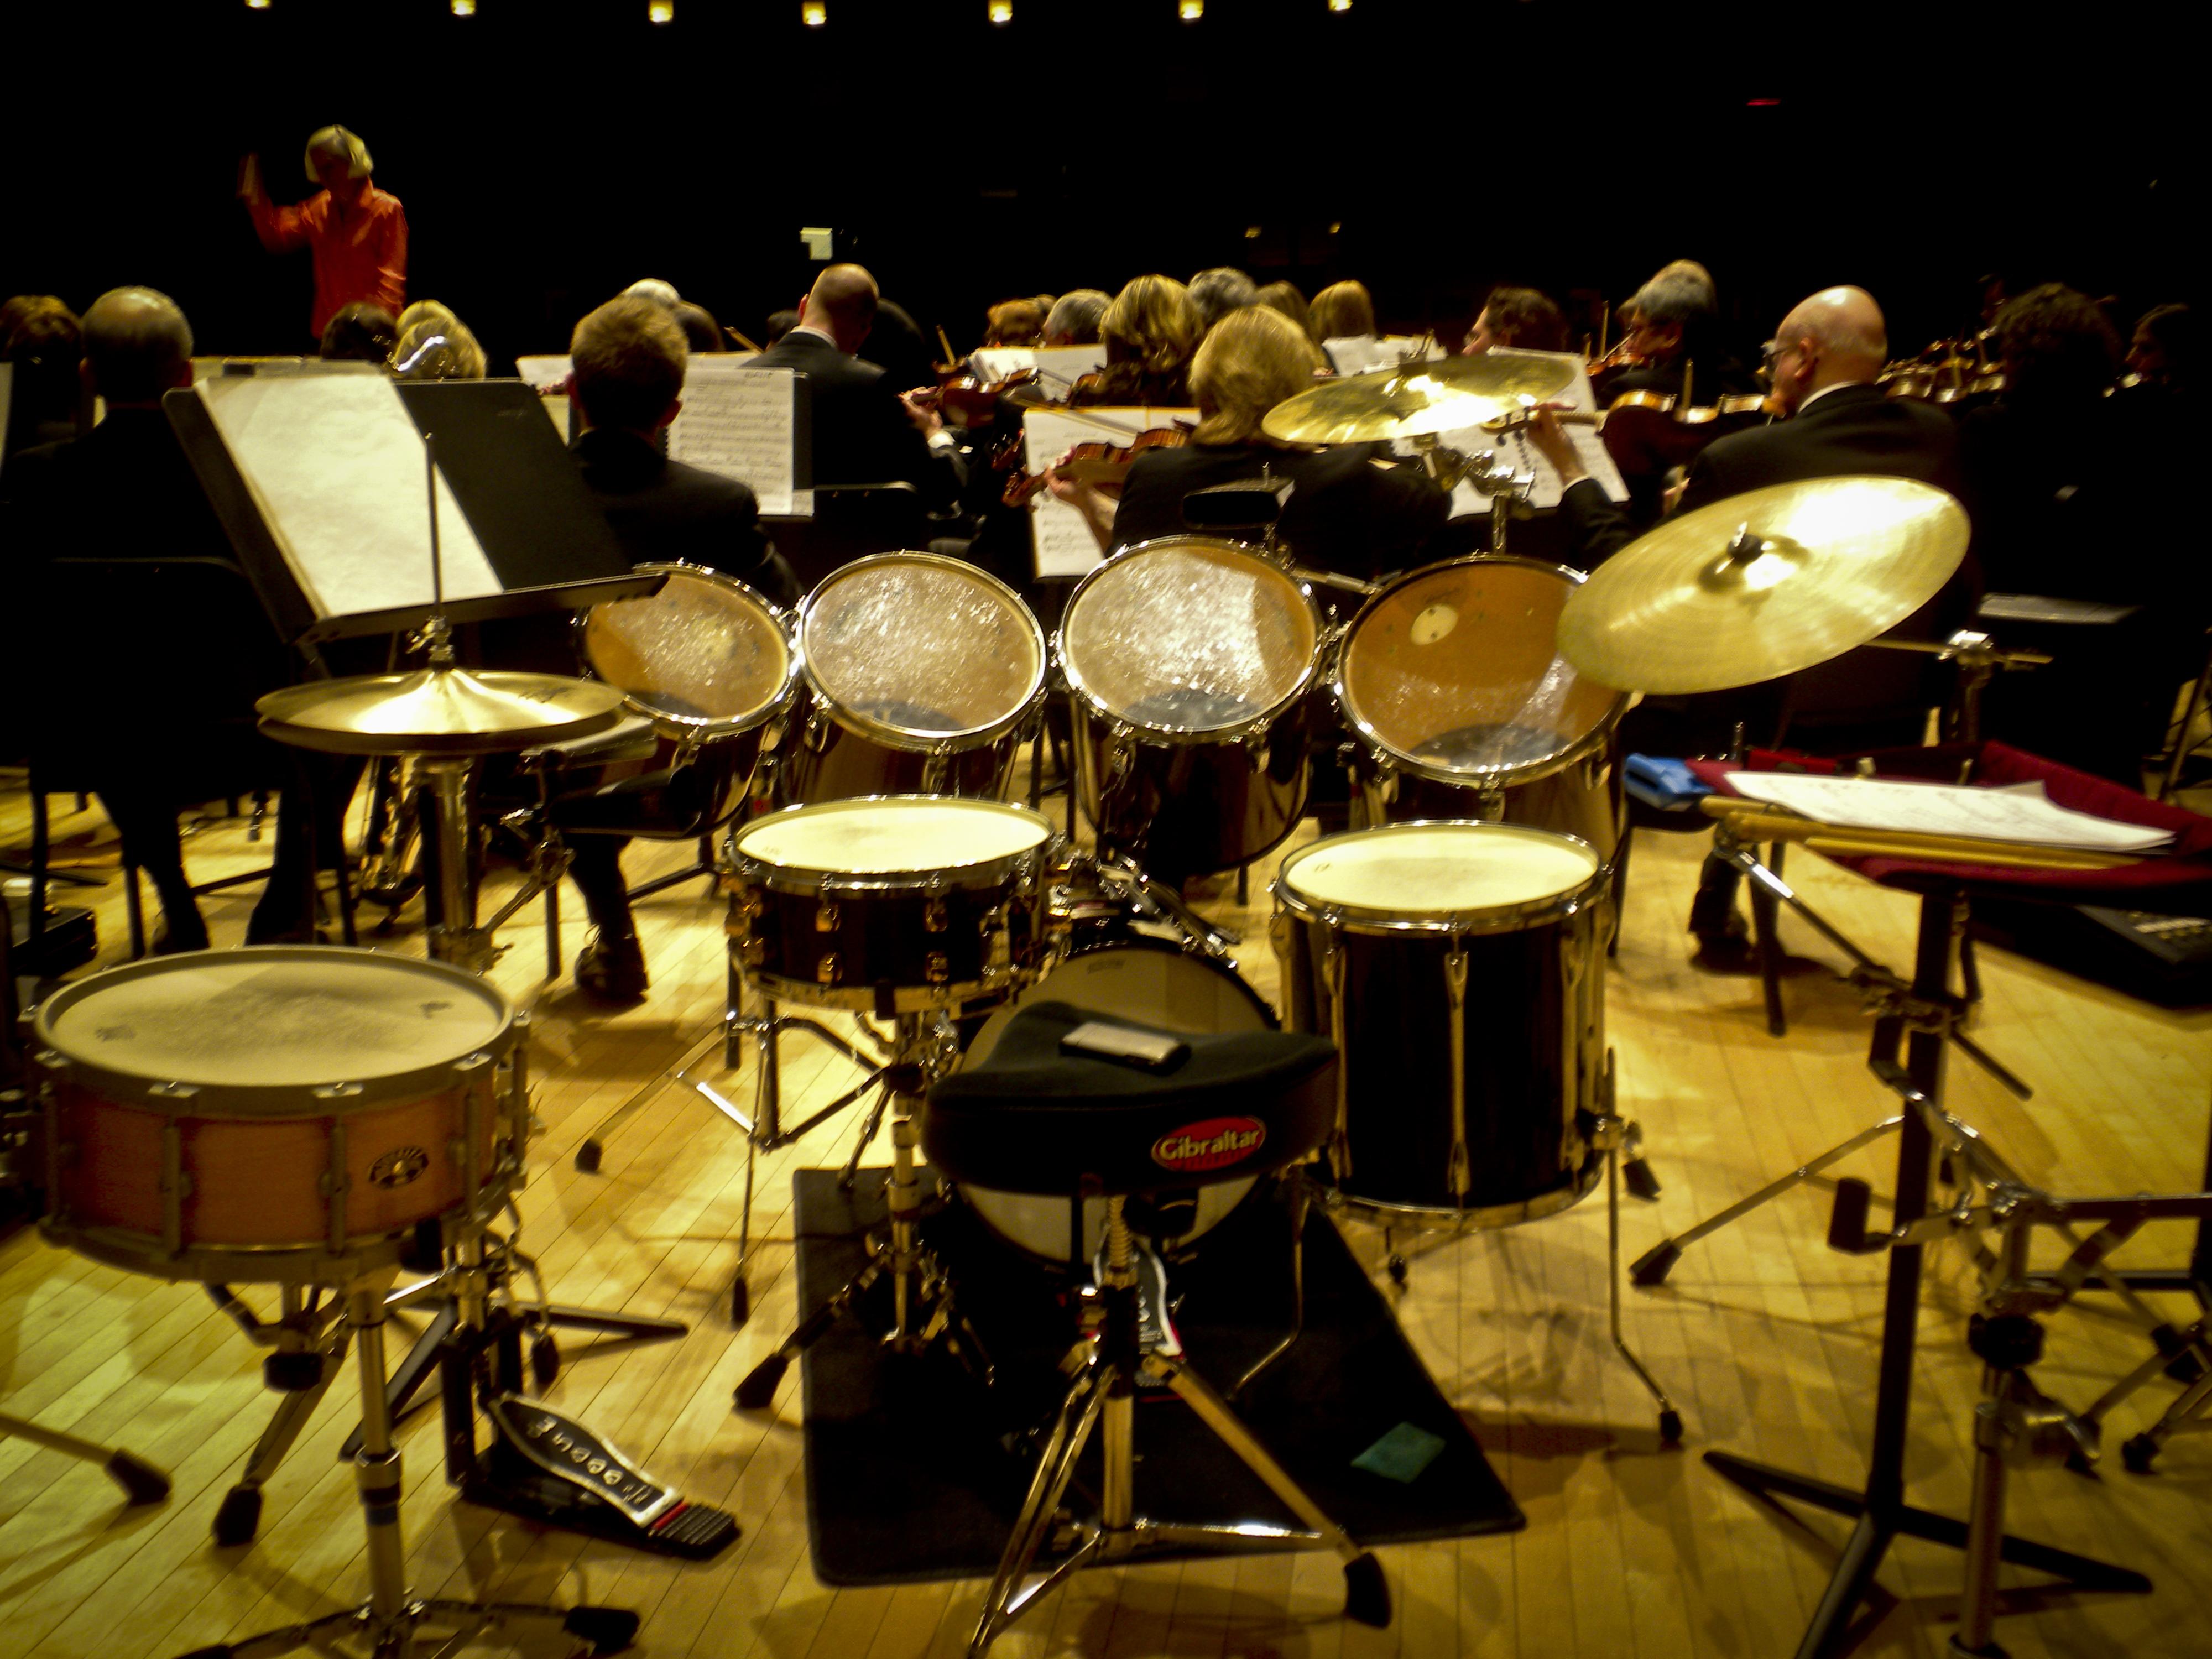 FileDrumset And Tom Tom Setup For Symphonic Dances From